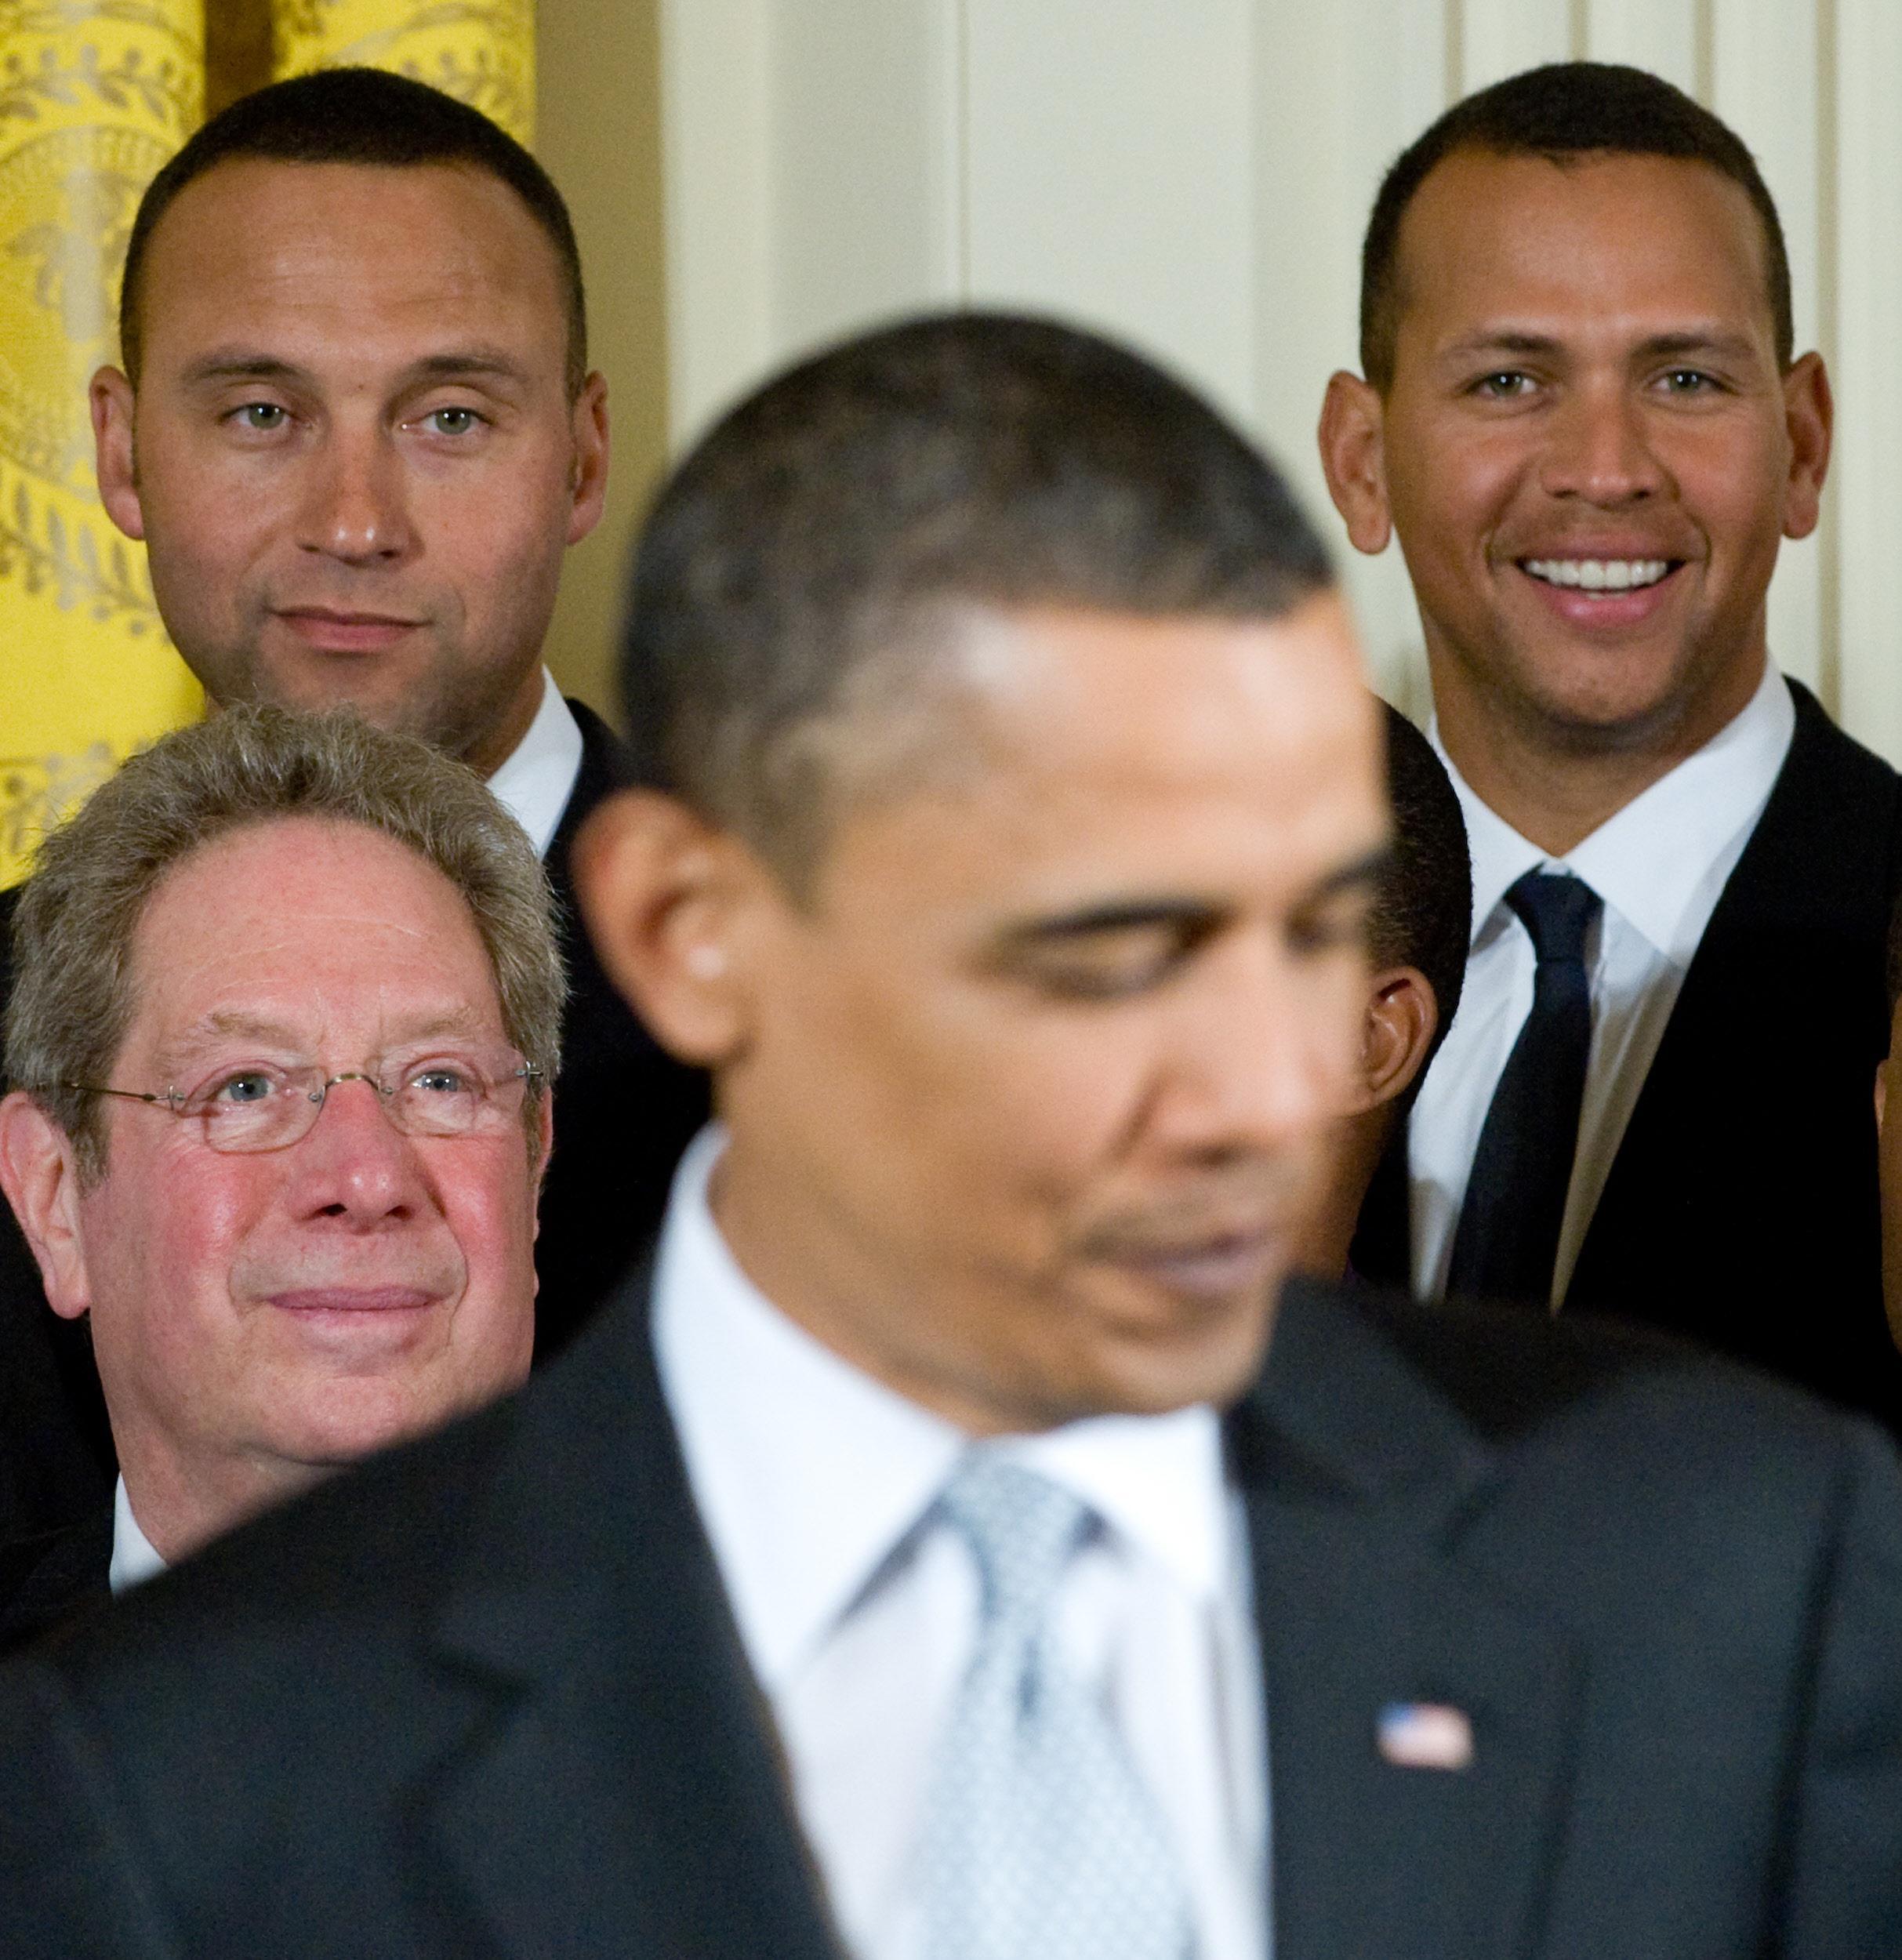 Obama, A-Rod and Jeter